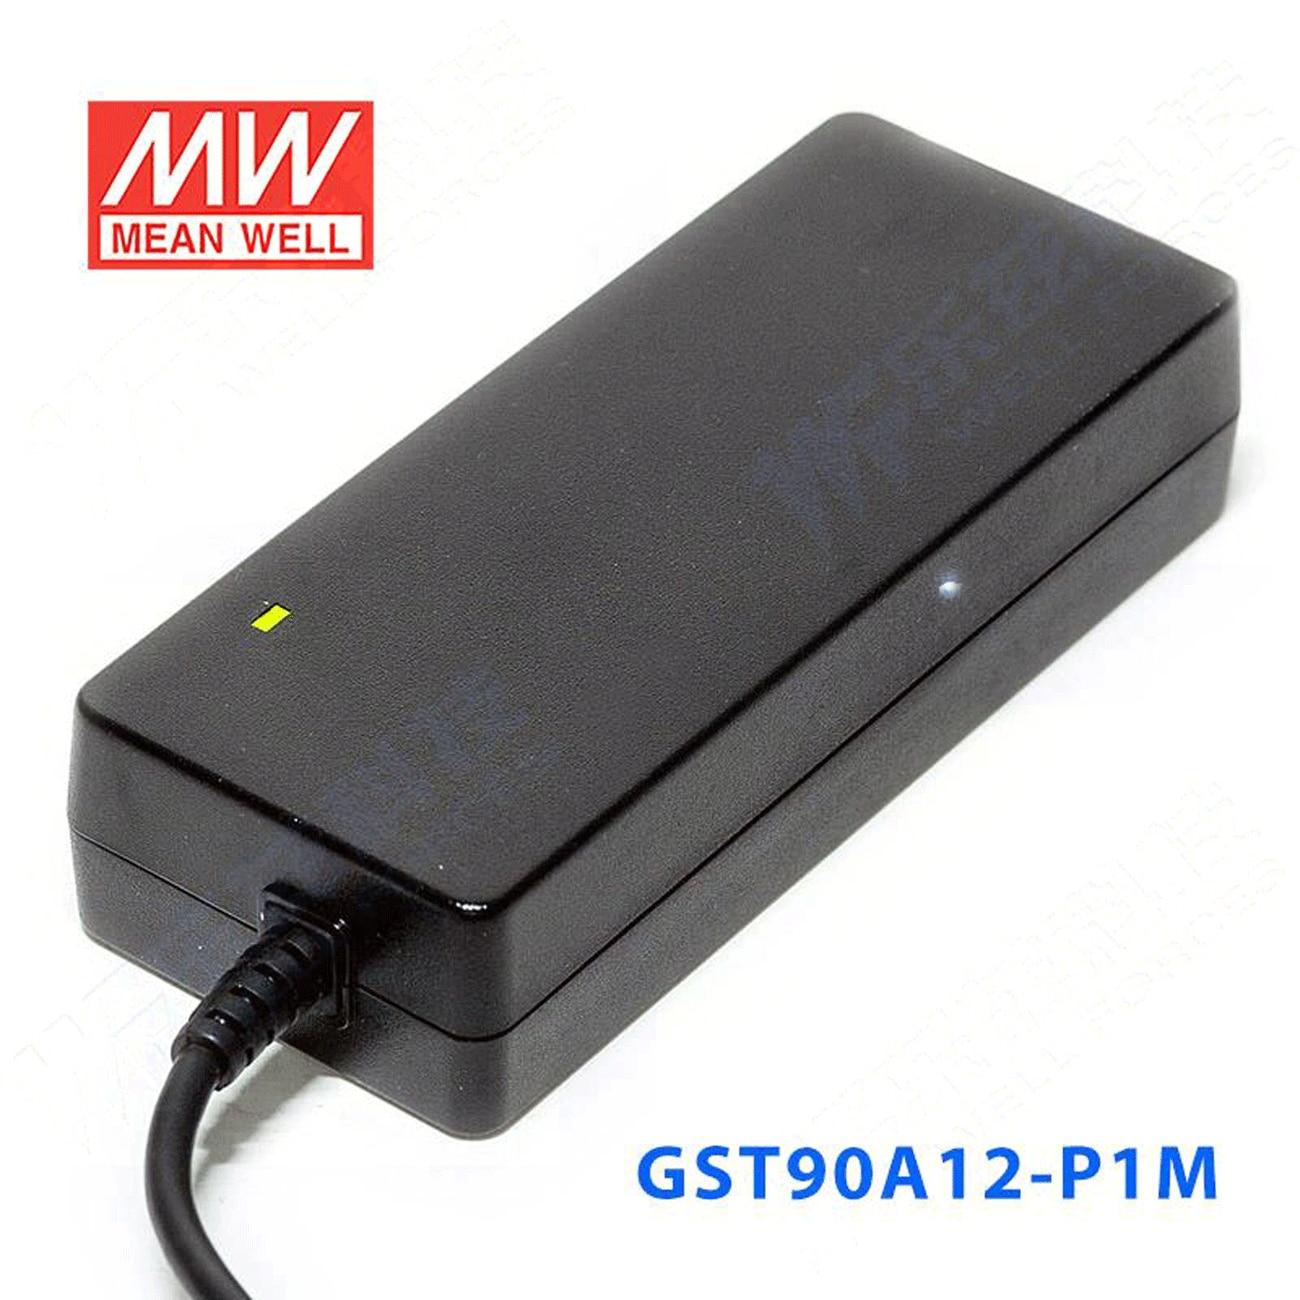 kindly MEAN WELL 6Pack GST90A12-P1M 12V 6.67A GST90A 12V 80W AC-DC High Reliability Industrial Adaptor